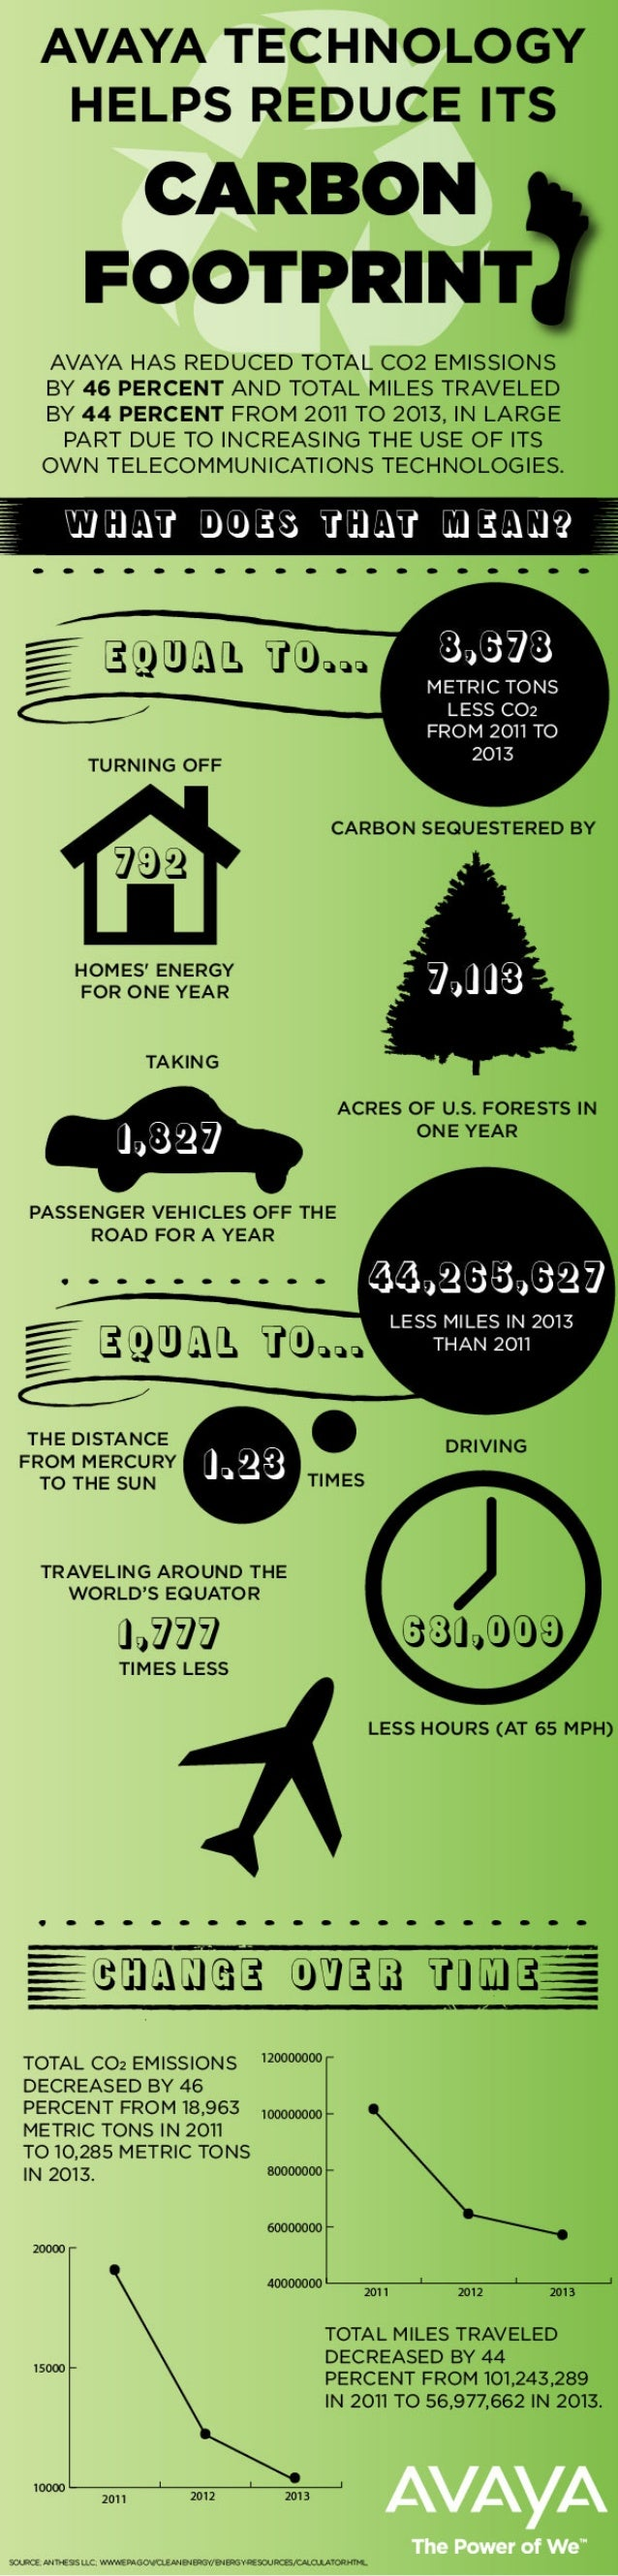 Earth Day 2014: Avaya